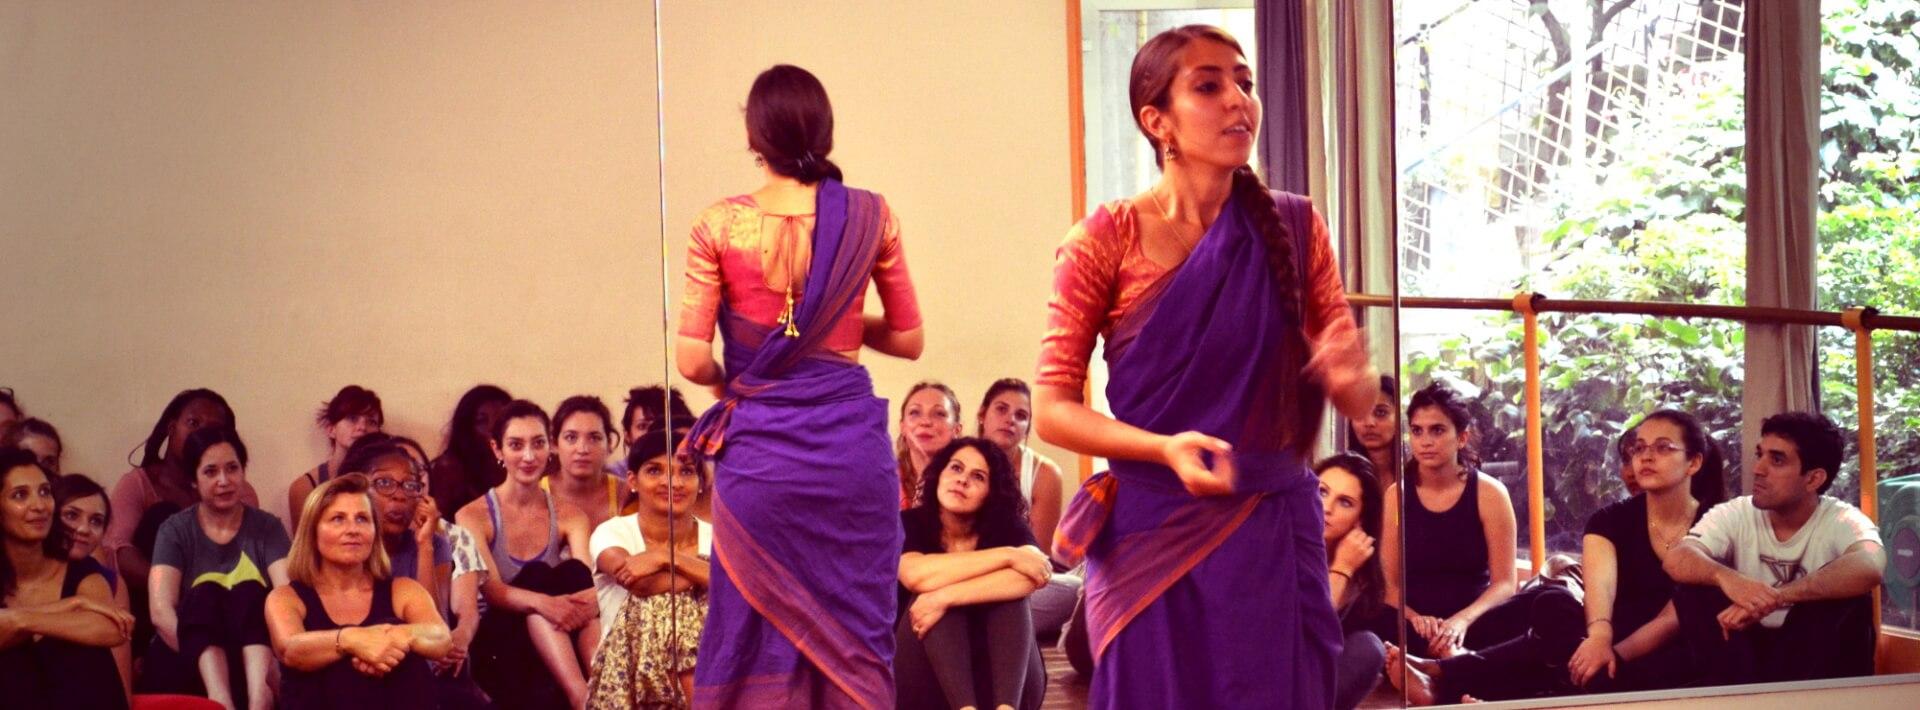 Mahina Khanum cours danse Odissi